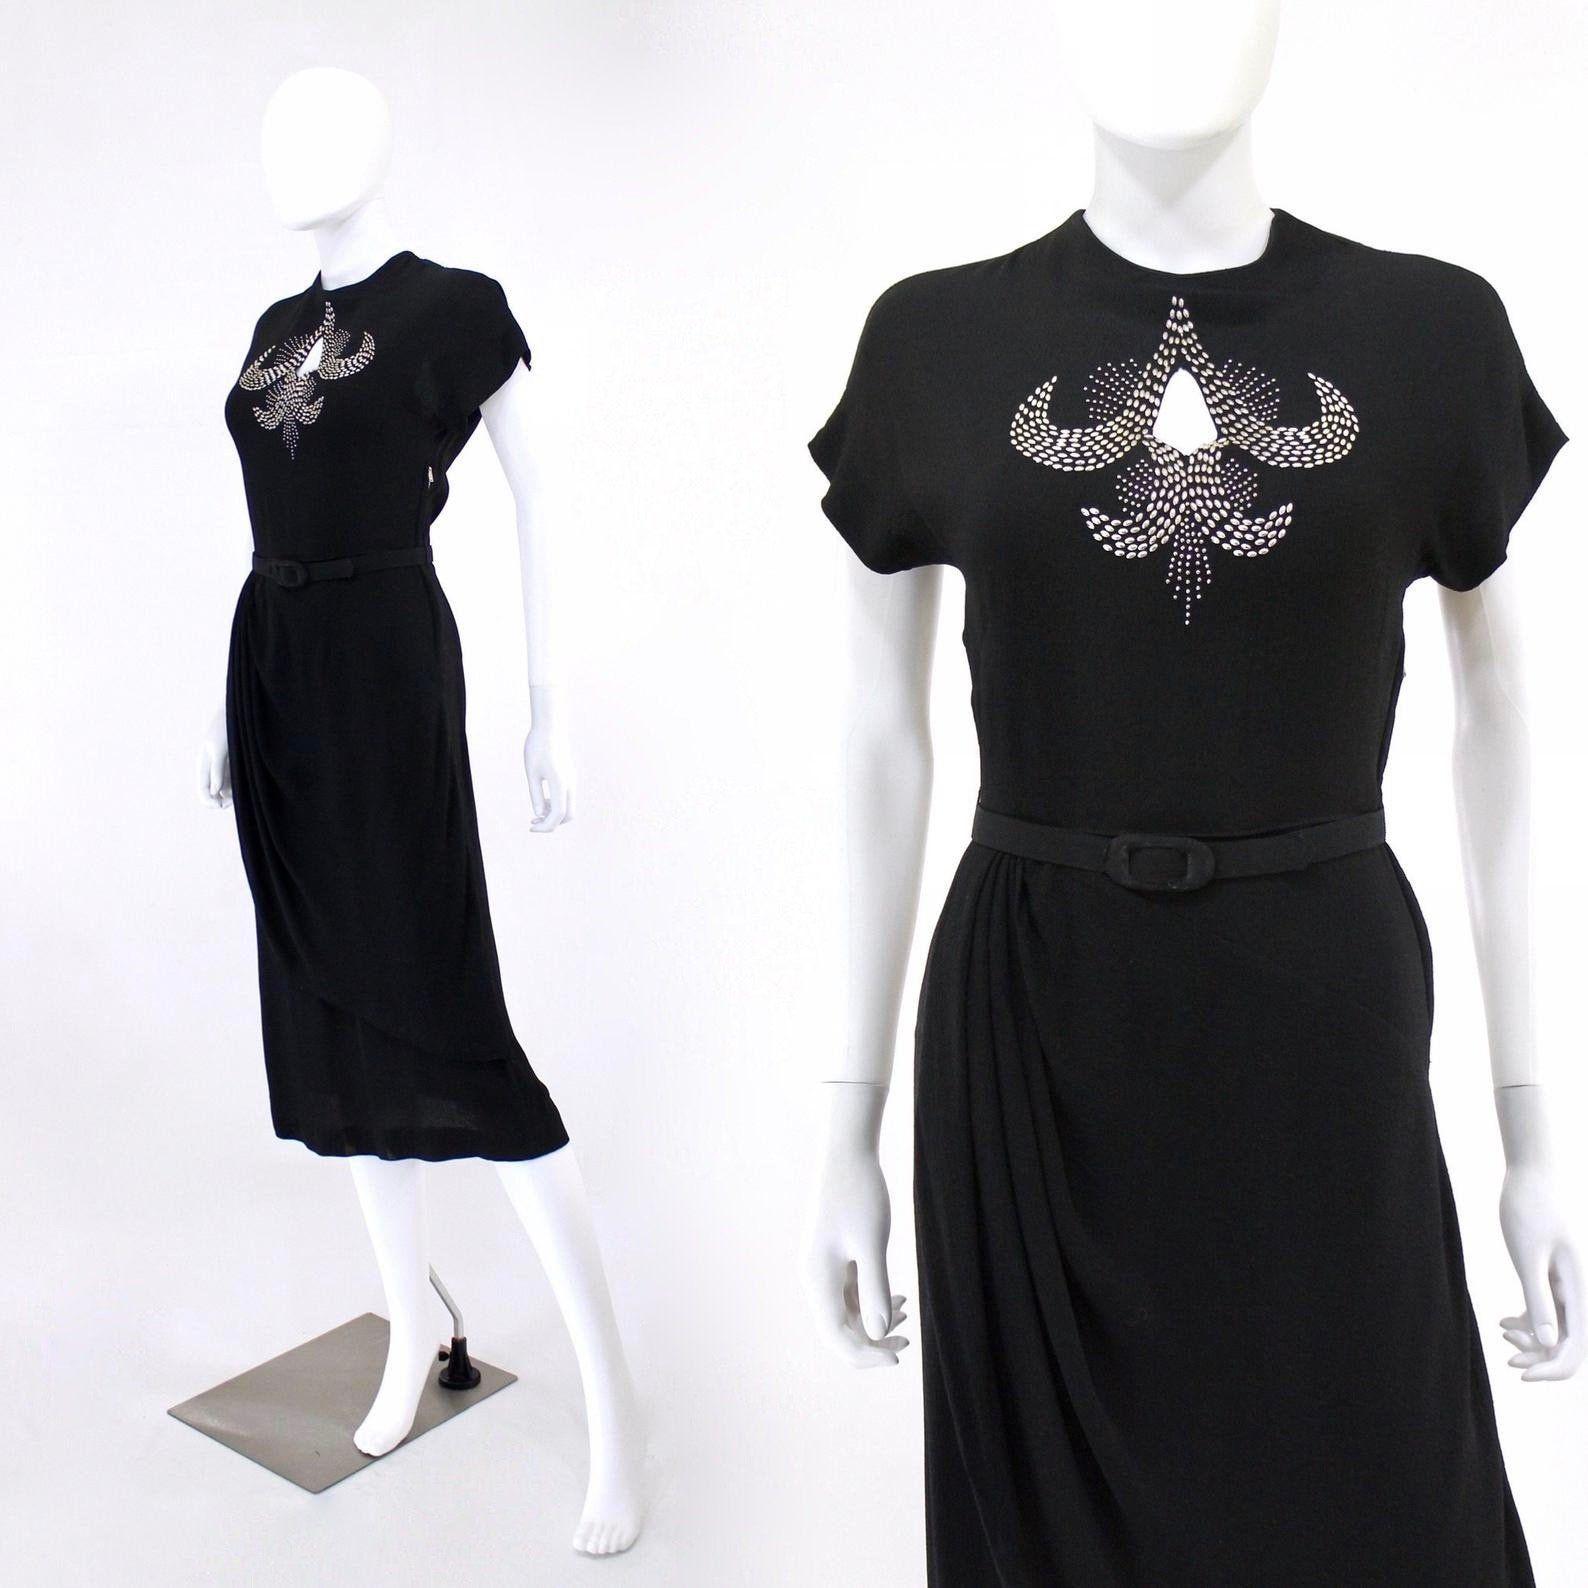 1940s Black Dress 40s Lbd Black Crepe Cocktail Dress Vintage 1940s Dress With Silver Tone Studding 40s Cocktail Dress Vintage Dresses 40s Studded Dress [ 1588 x 1588 Pixel ]